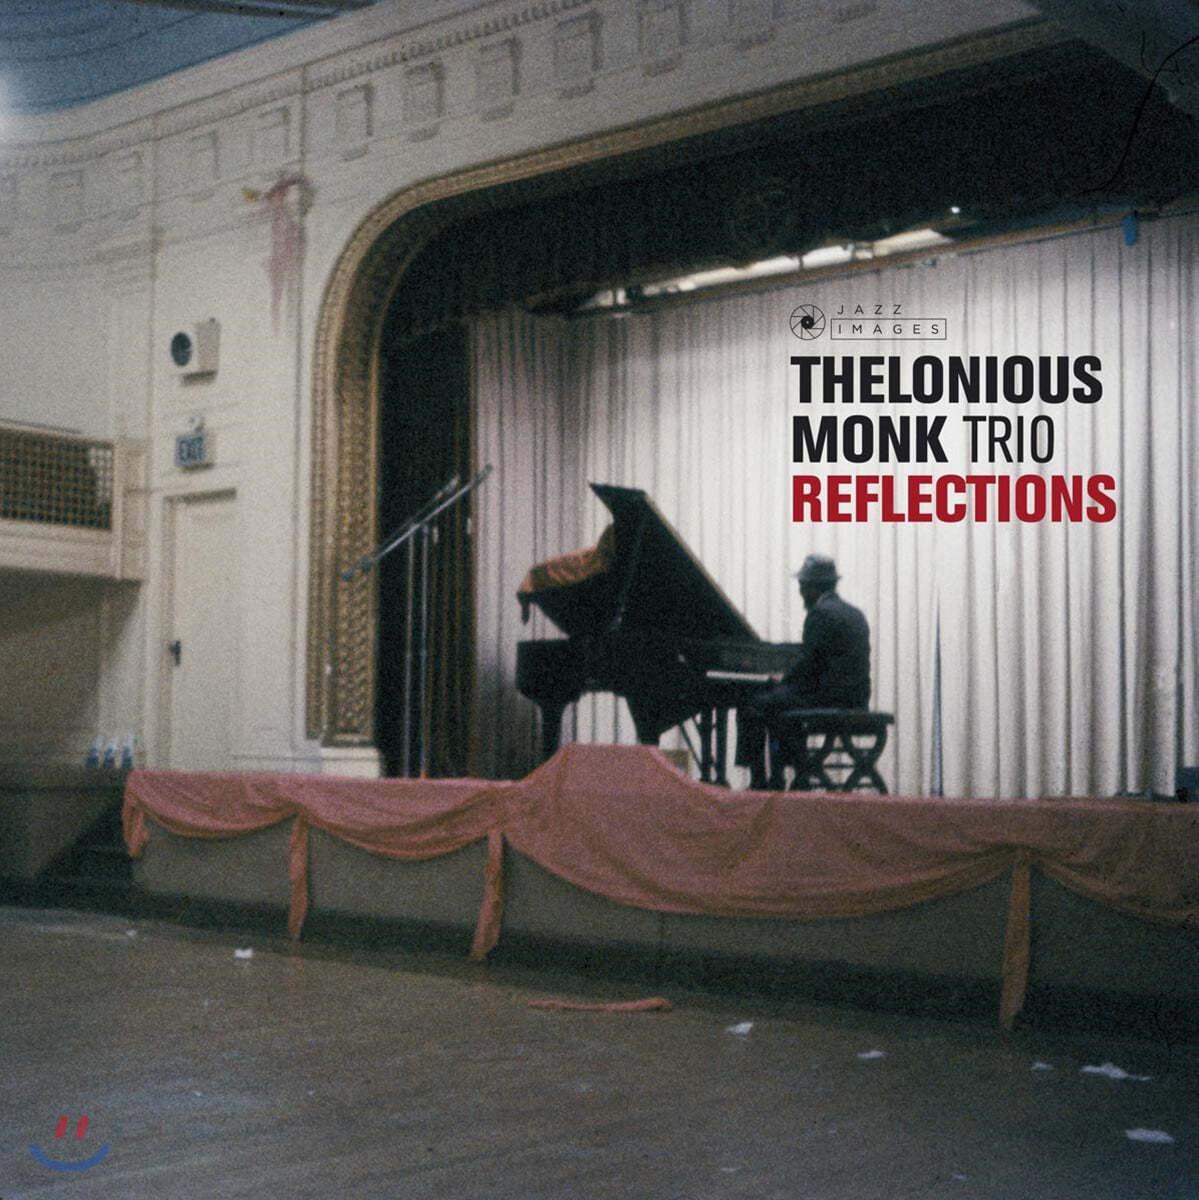 Thelonious Monk Trio (텔로니어스 몽크 트리오) - Reflections [LP]